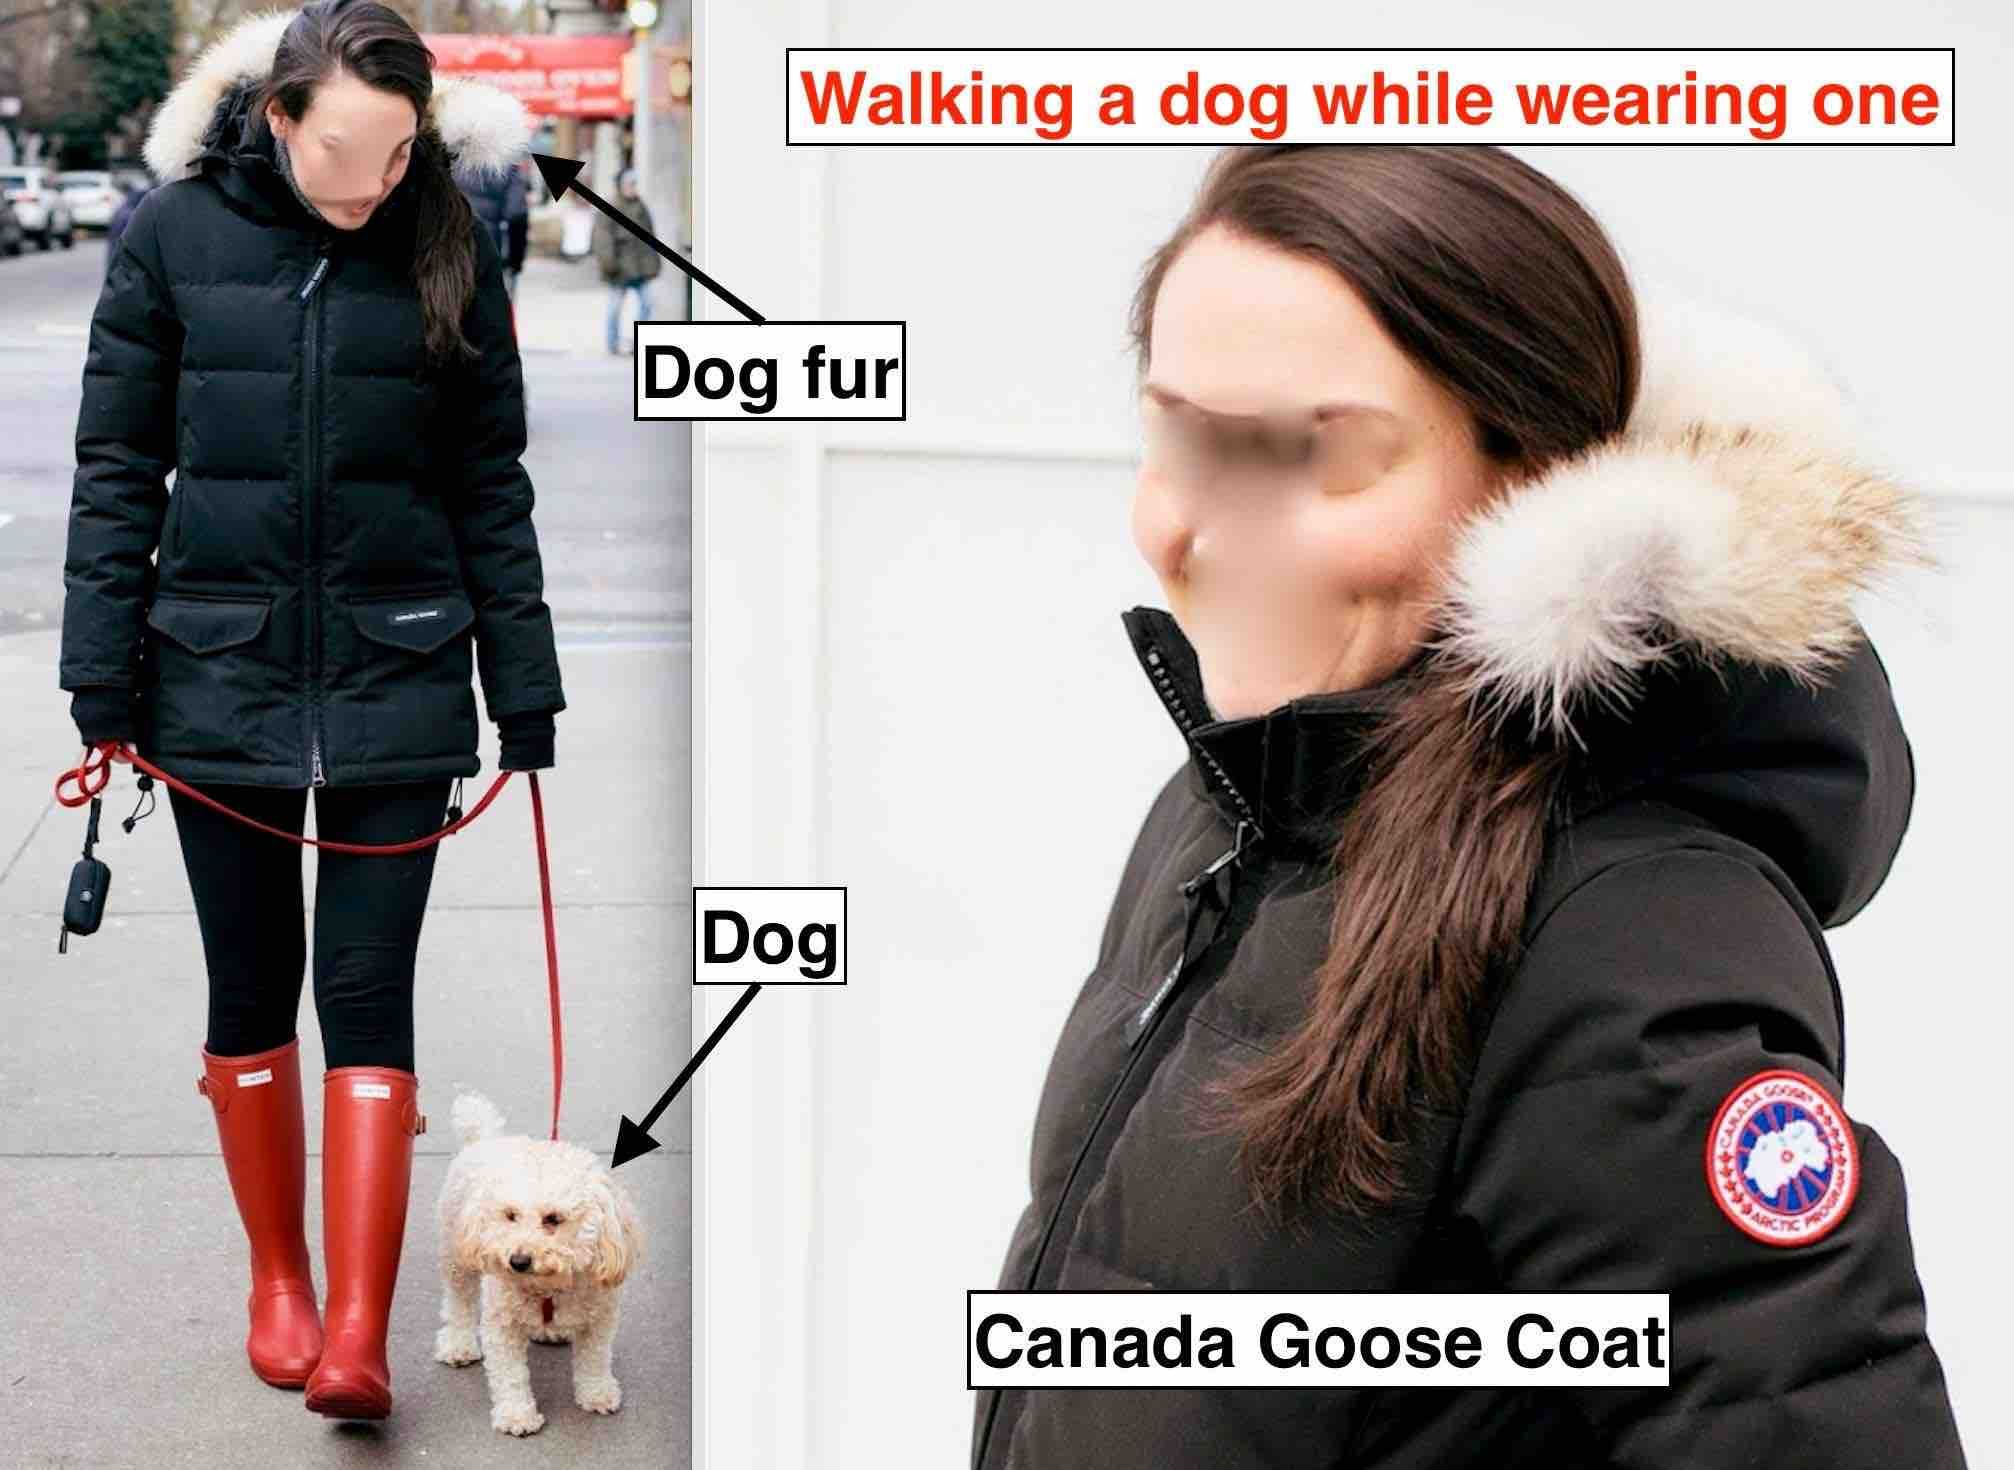 canada goose jacket dog fur